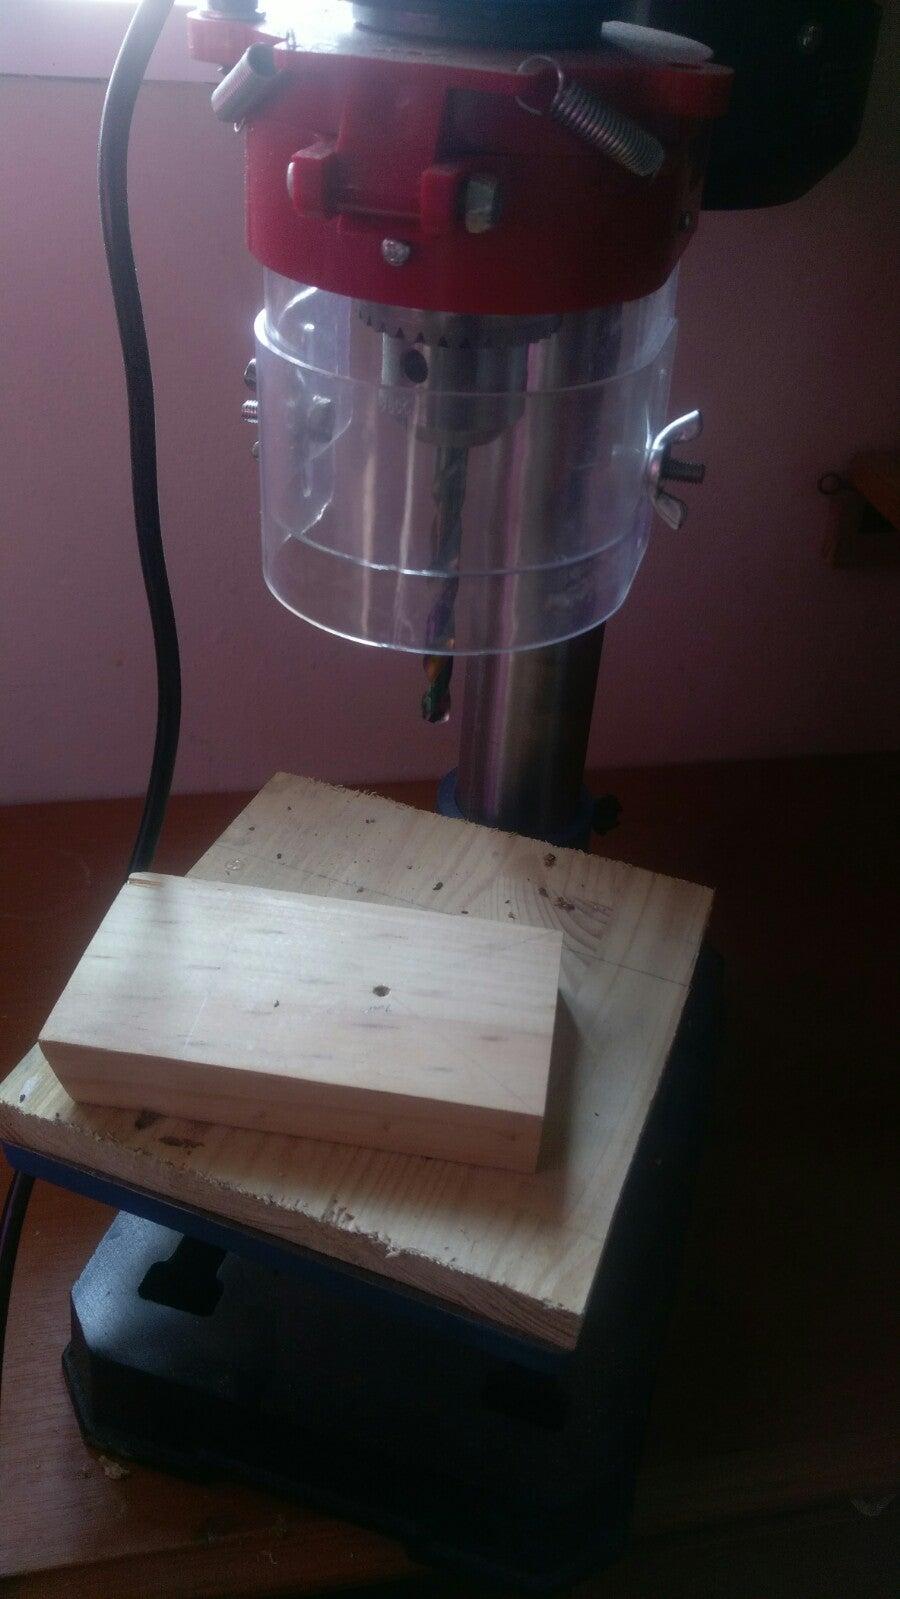 Step 3 - Drilling